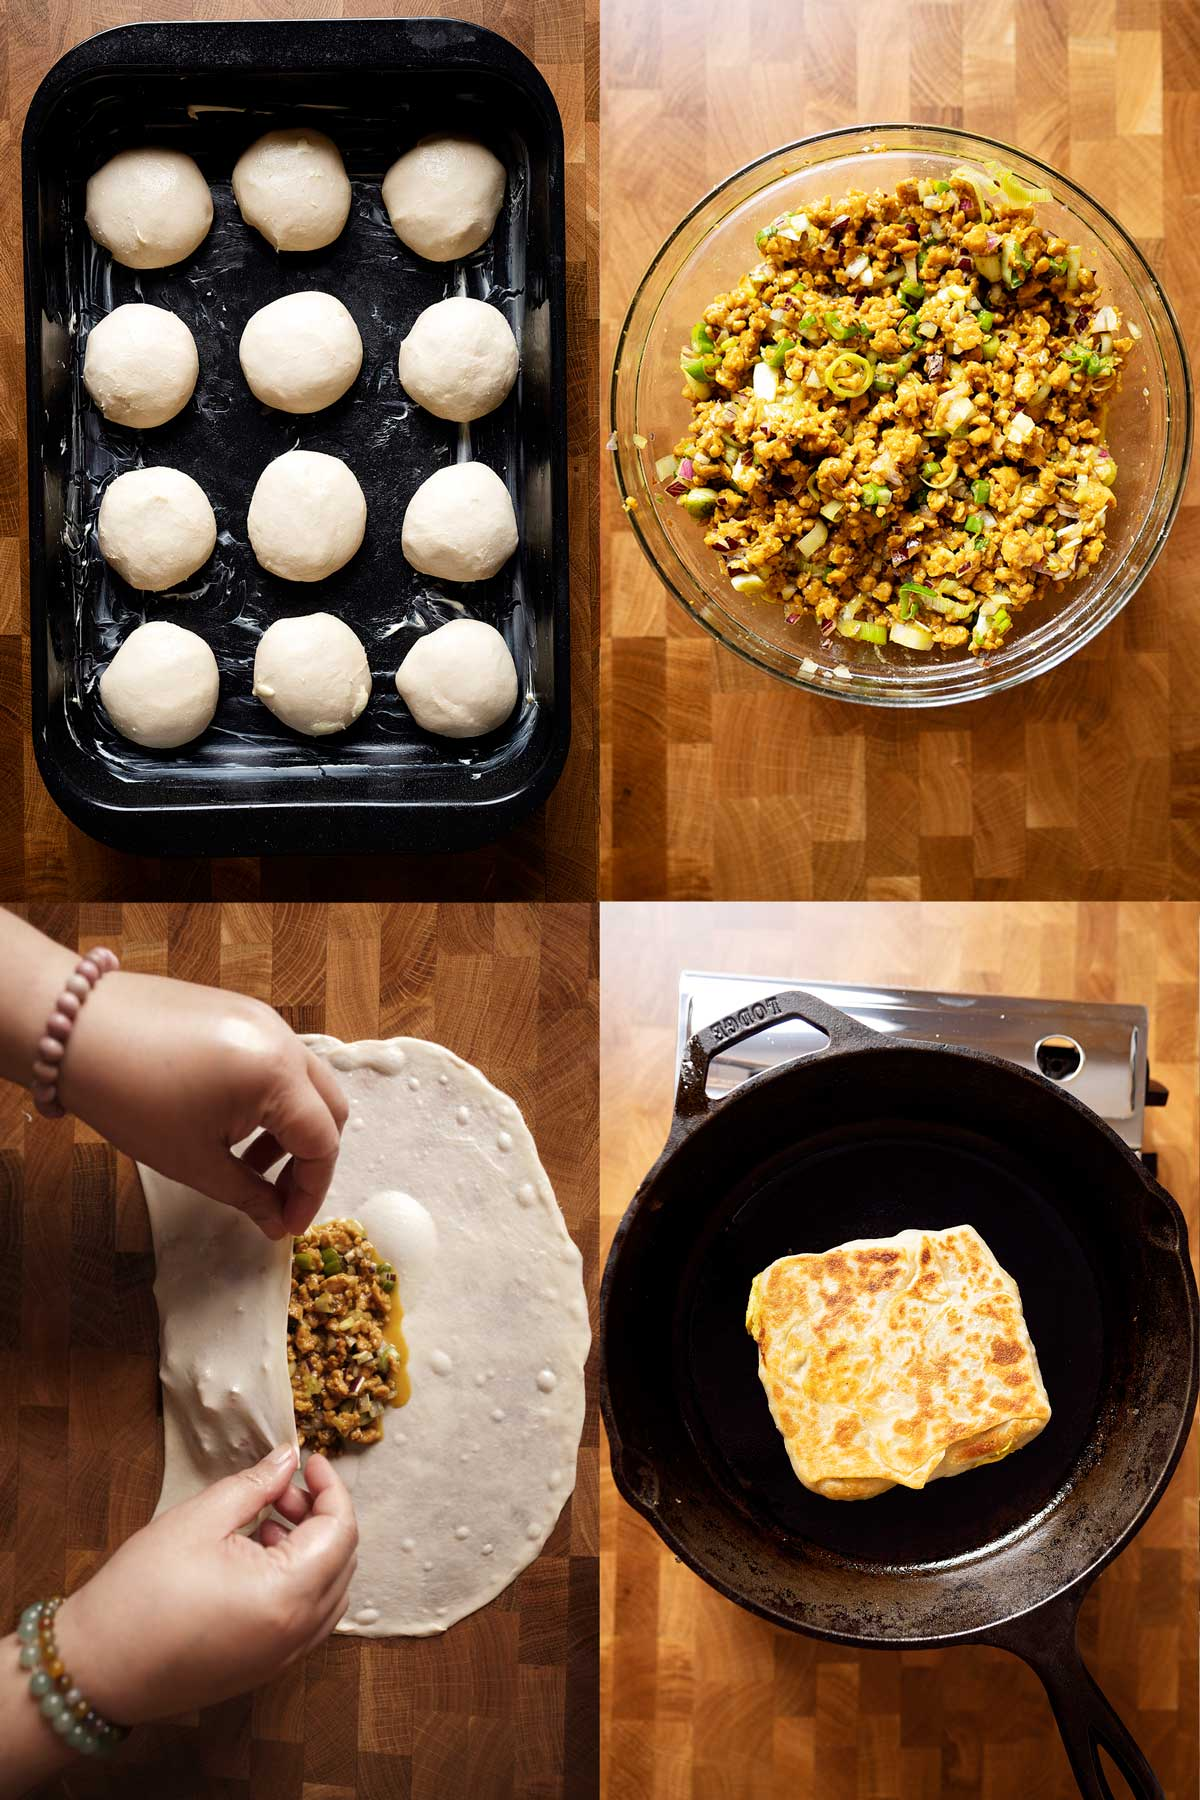 Steps of making chicken murtabak flatbreads